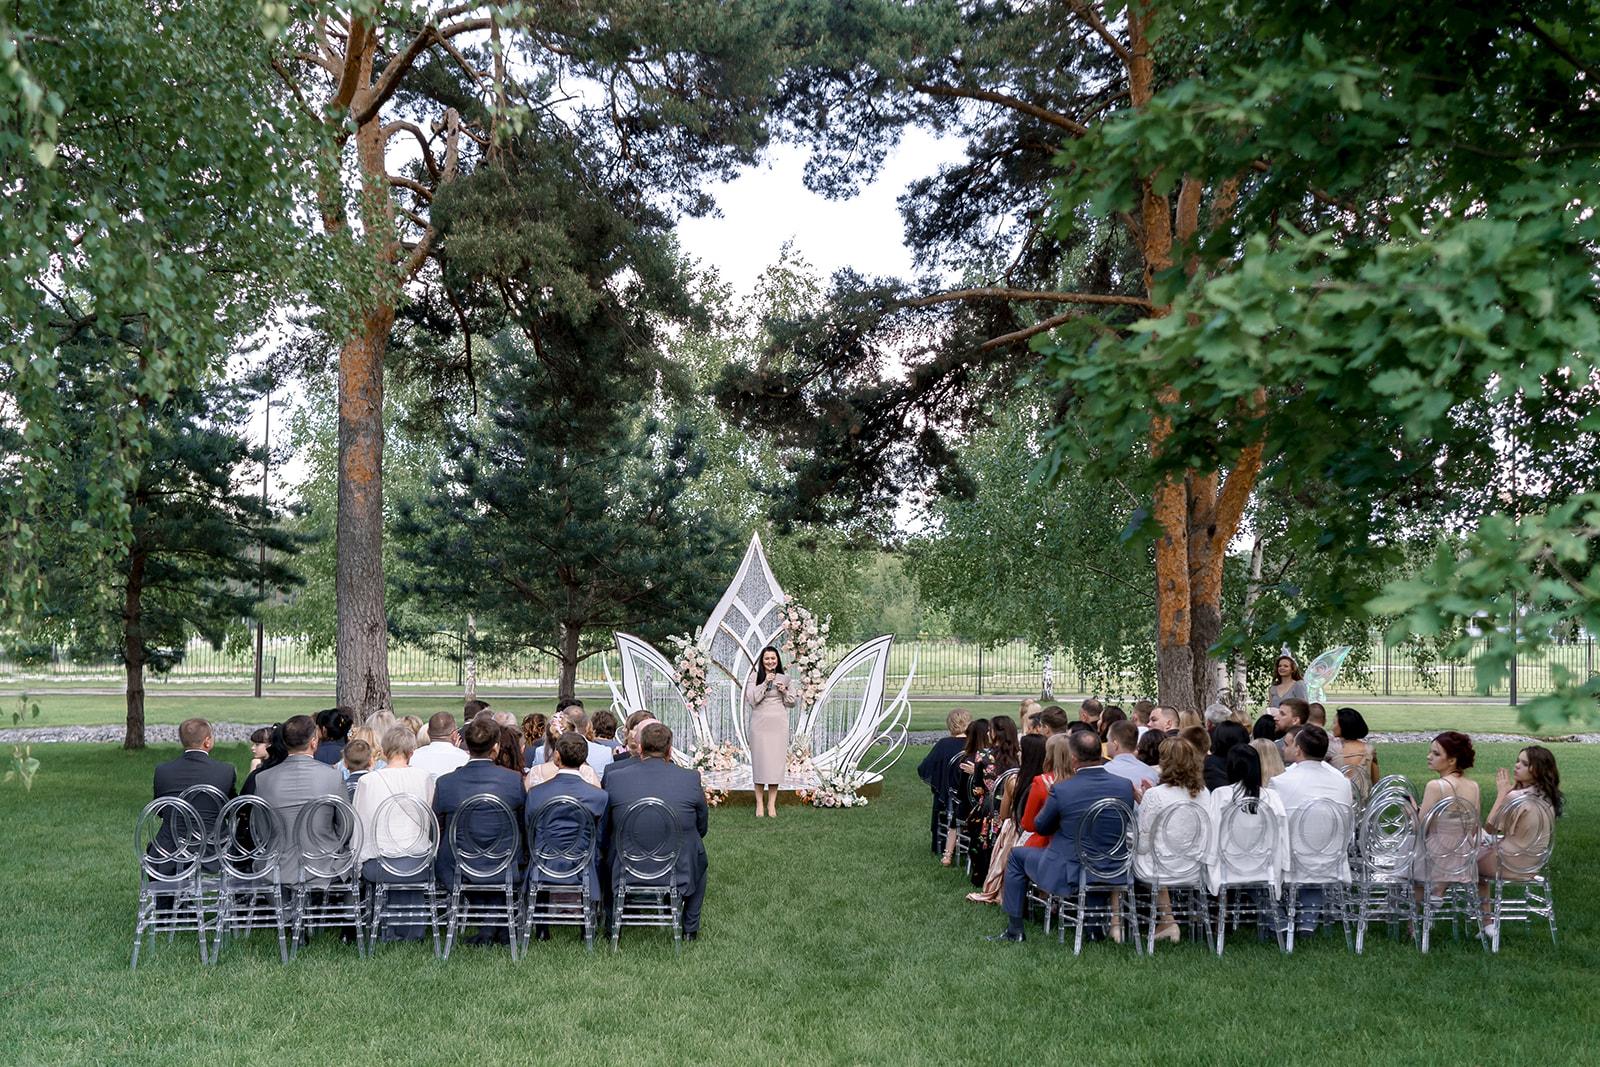 Свадьба в Шале Березка. Ведущая церемоний Евгения Кор. Фотограф Роман Иванов